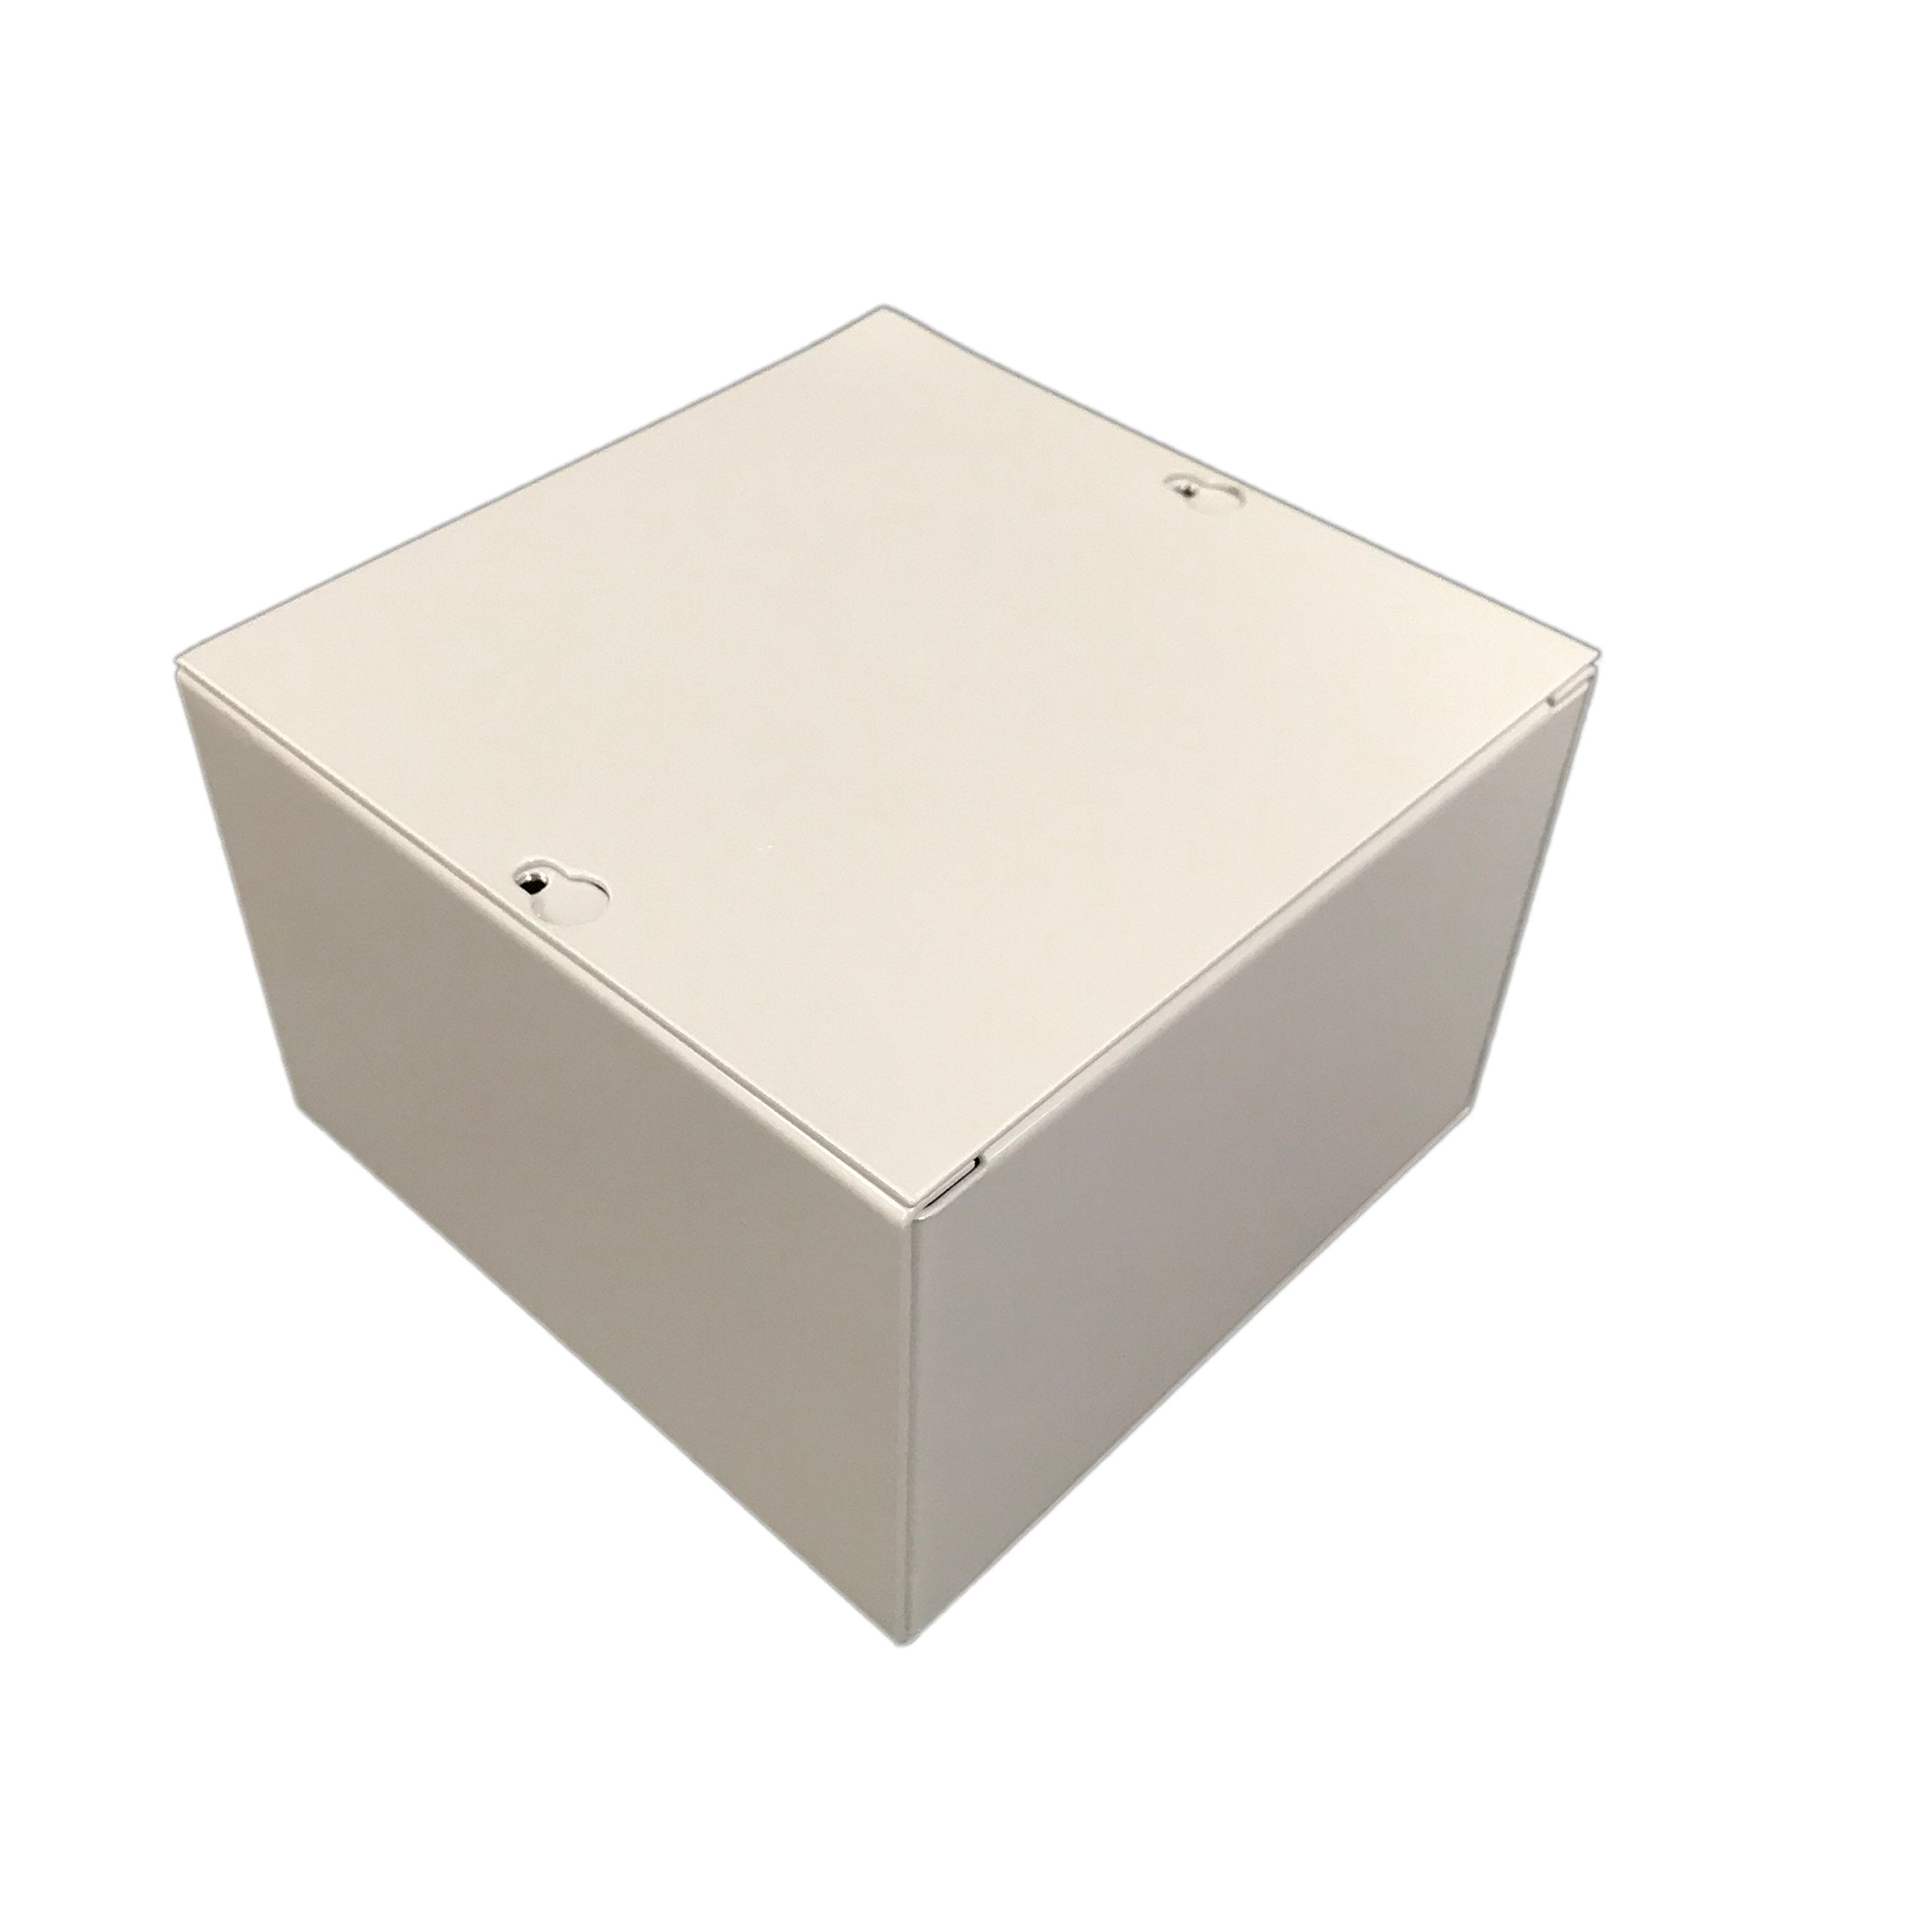 BUD Industries JB-3955 Steel NEMA 1 Sheet Metal Junction Box with Lift-off Screw Cover, 6'' Width x 6'' Height x 4'' Depth, Gray Finish